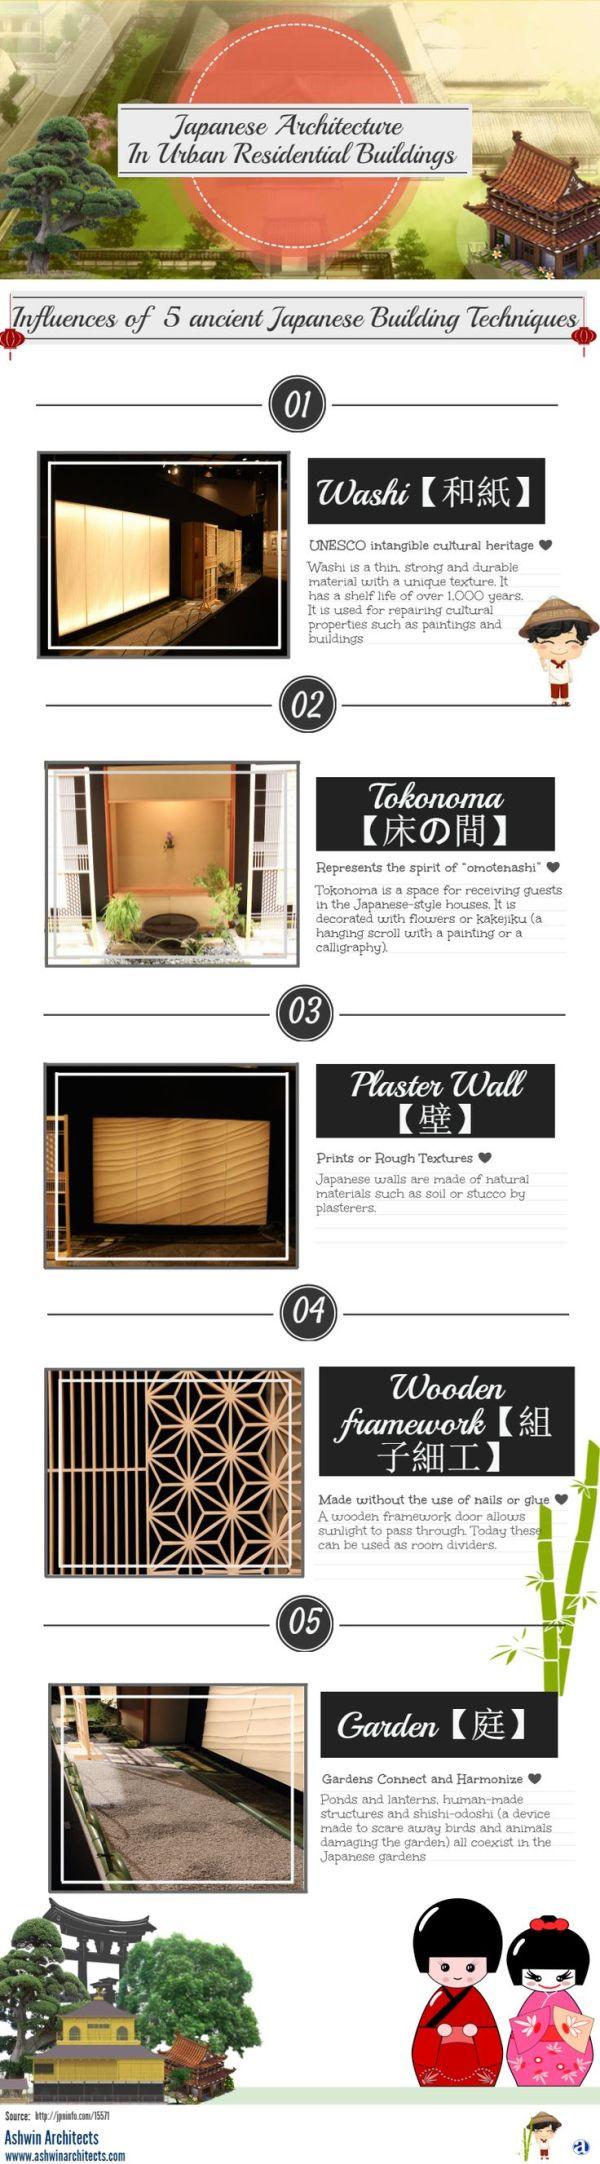 Japanese house designs